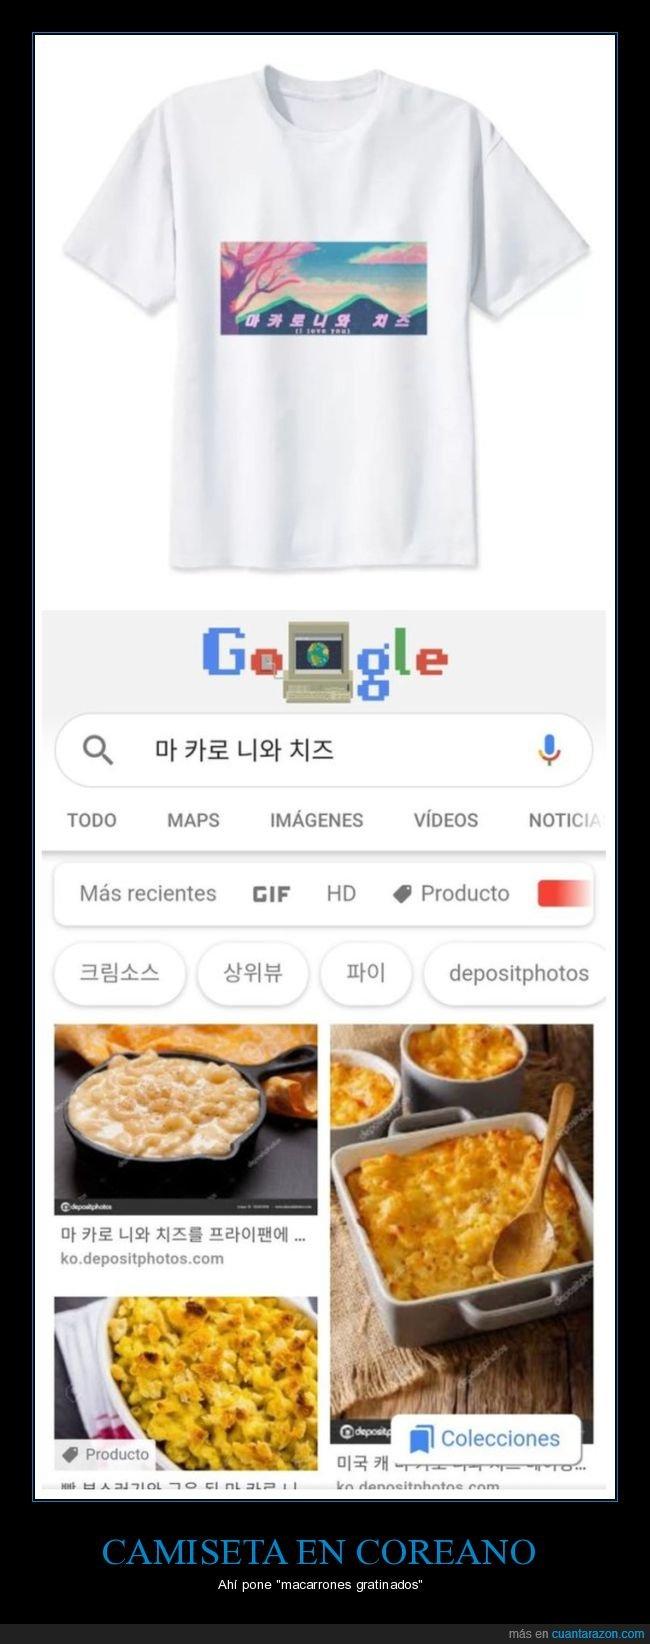 aliexpress,camiseta,coreano,fails,macarrones gratinados